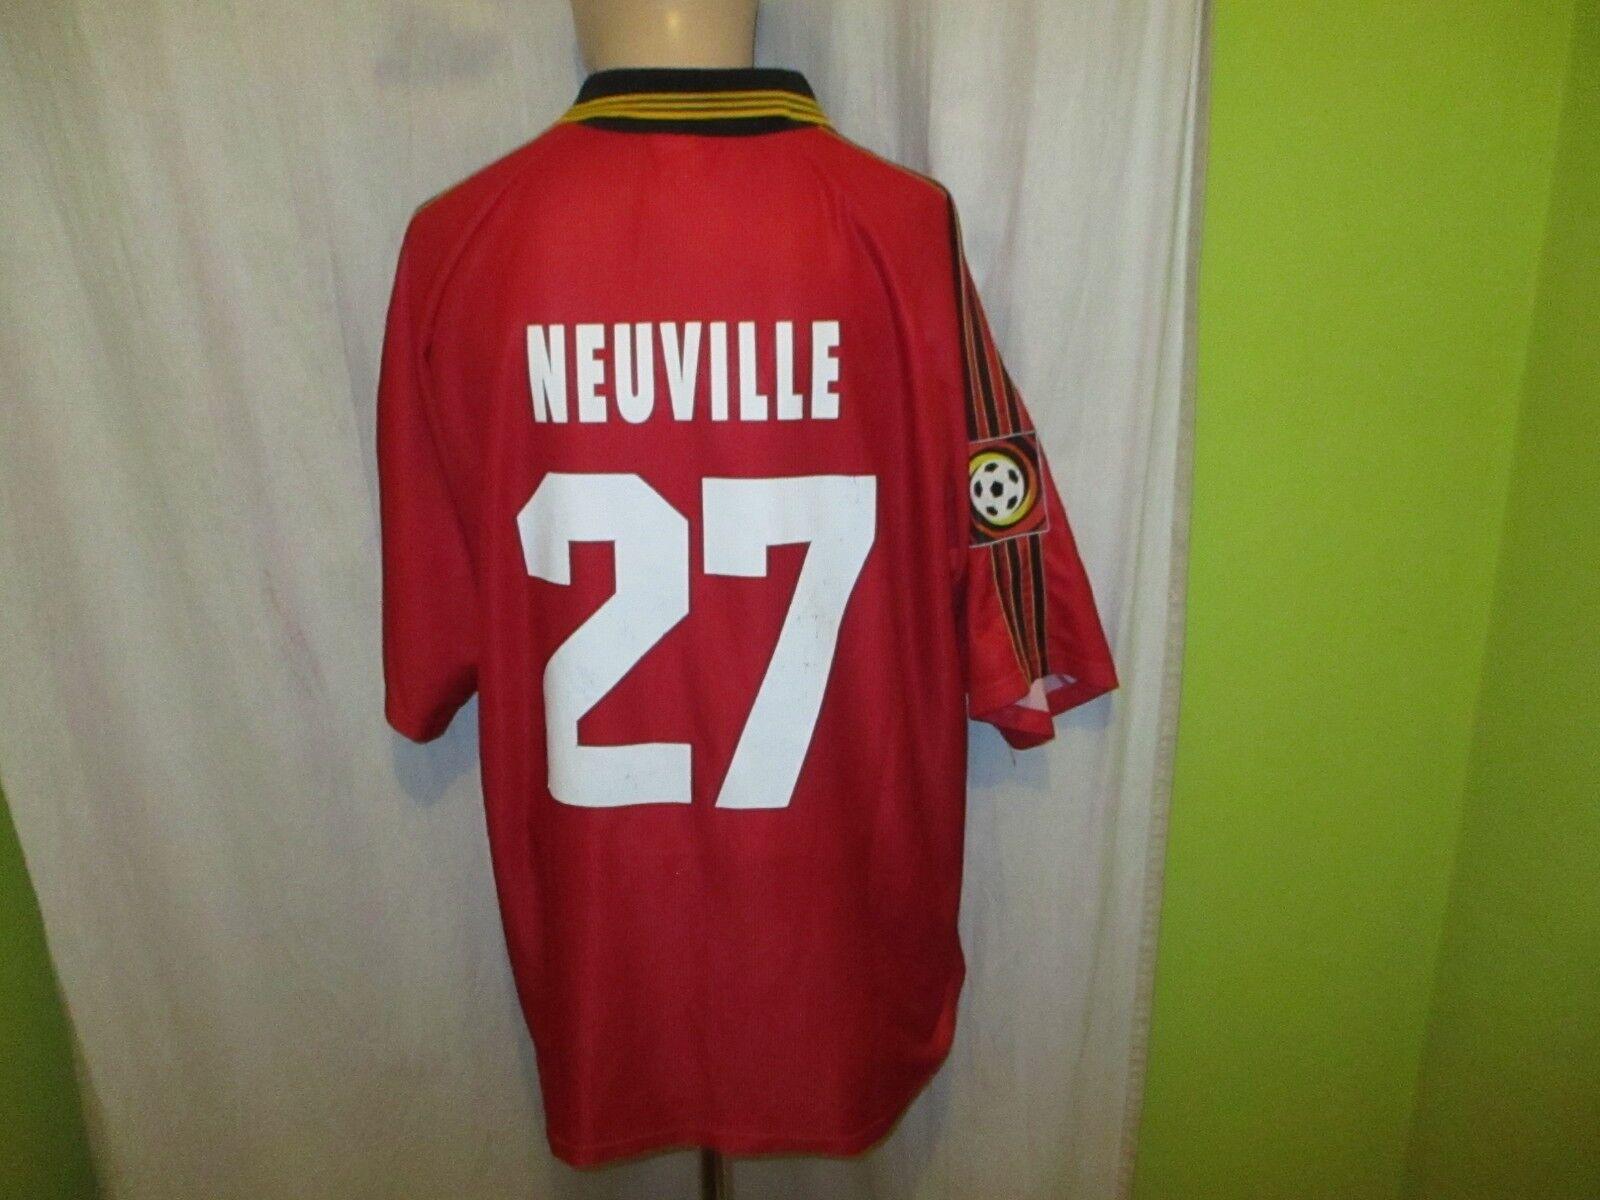 Bayer 04 Leverkusen Adidas Home Jersey 1998 99  Aspirin  + No 27 Neuville Größe XL